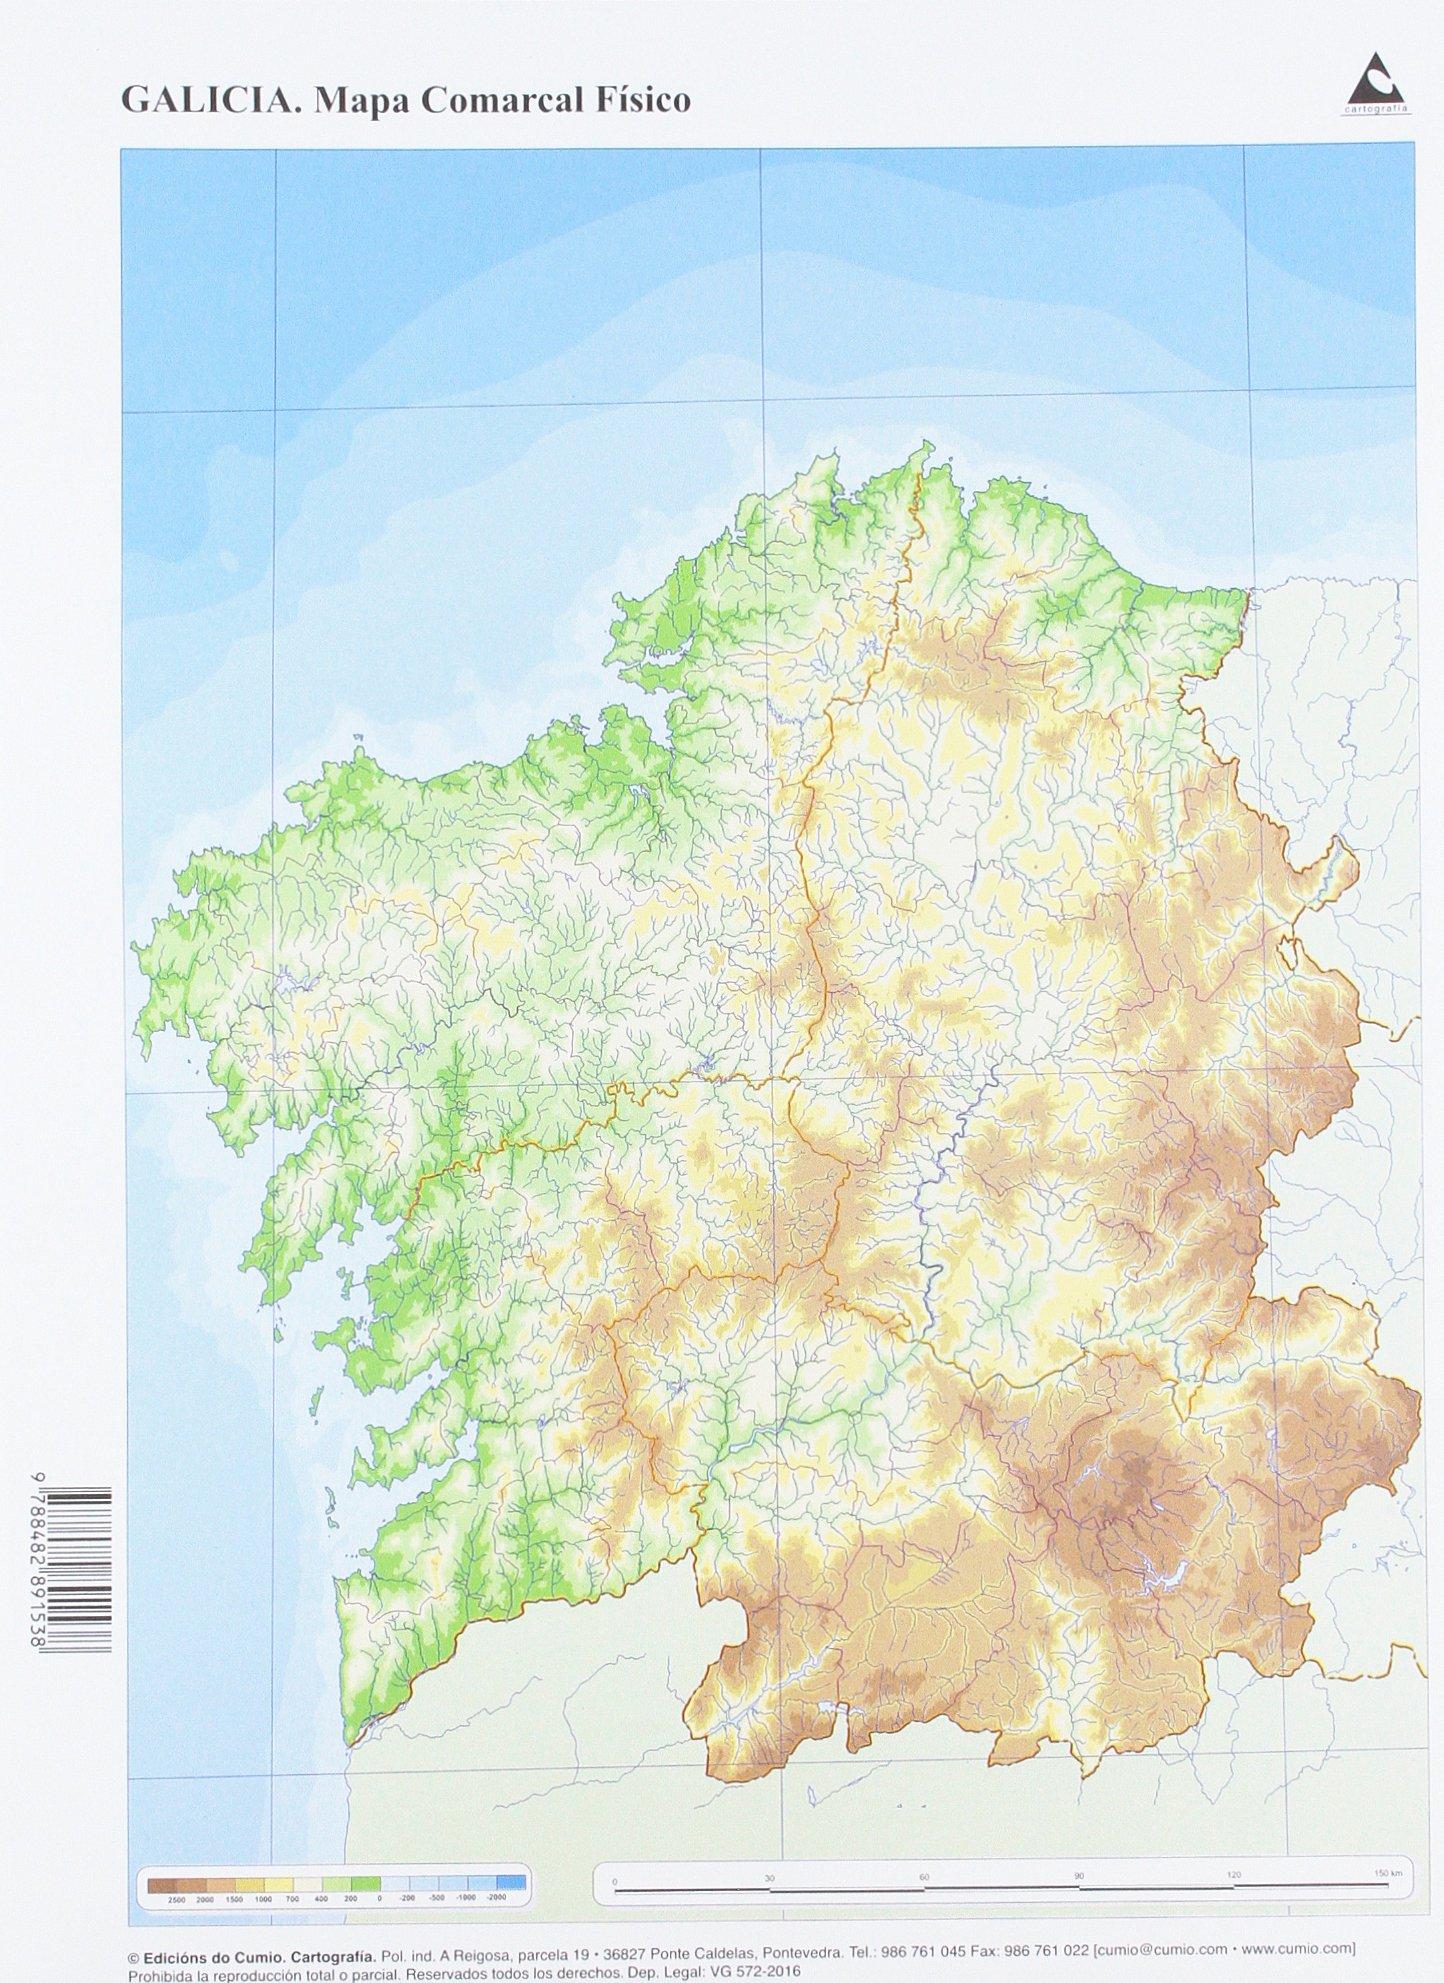 Mapa De Galicia Fisico Mudo.Mapa Fisico Galicia Comarcal Mapas Mudos Amazon Es